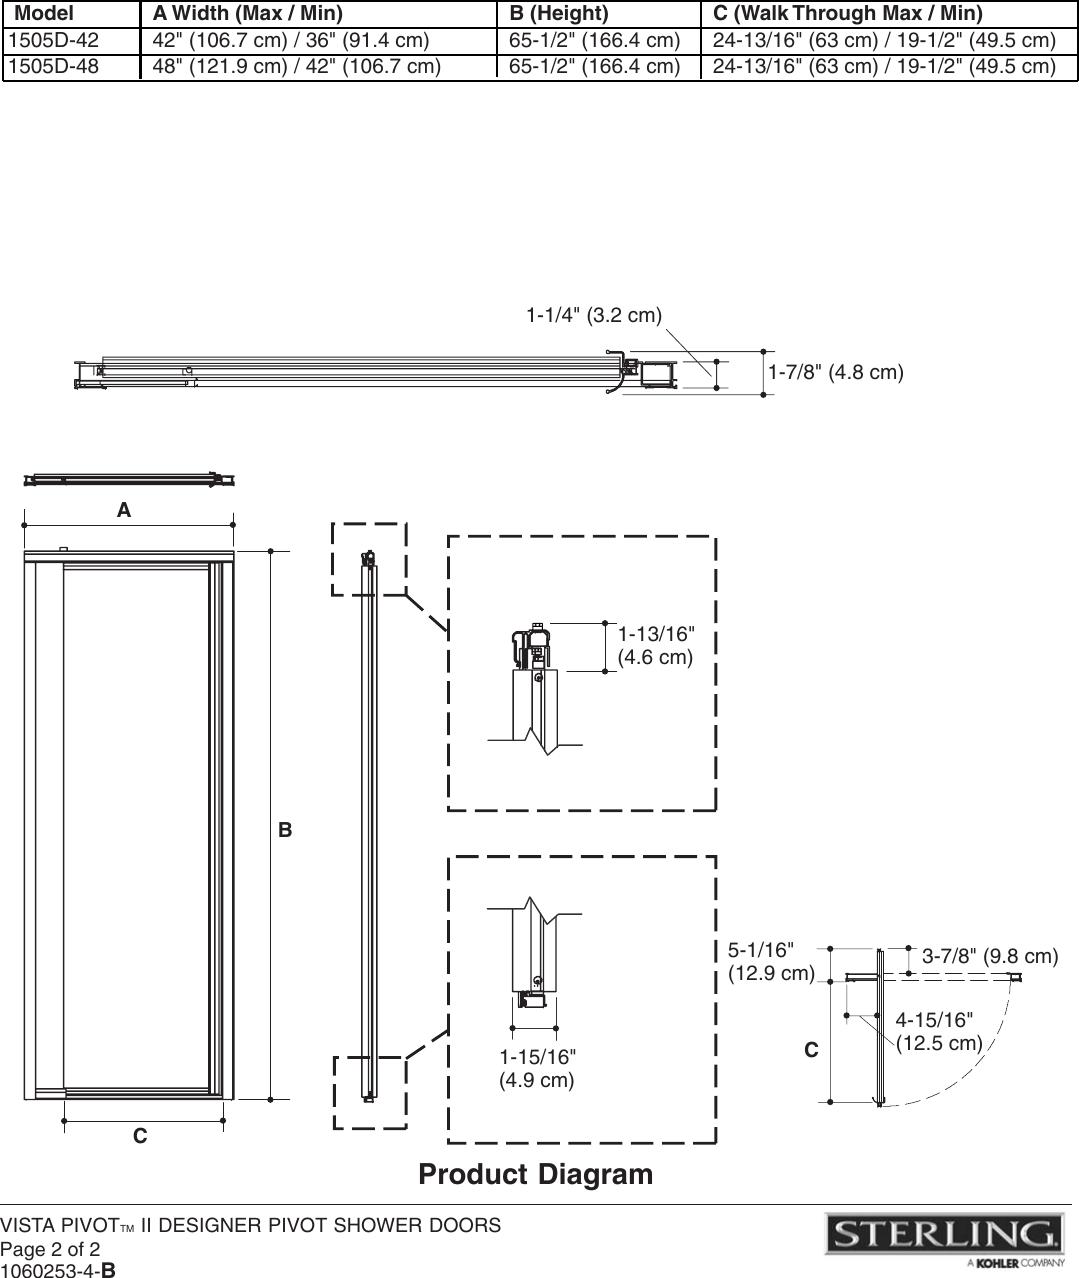 Sterling Plumbing Designer Pivot Shower Doors 1505d 42 Users